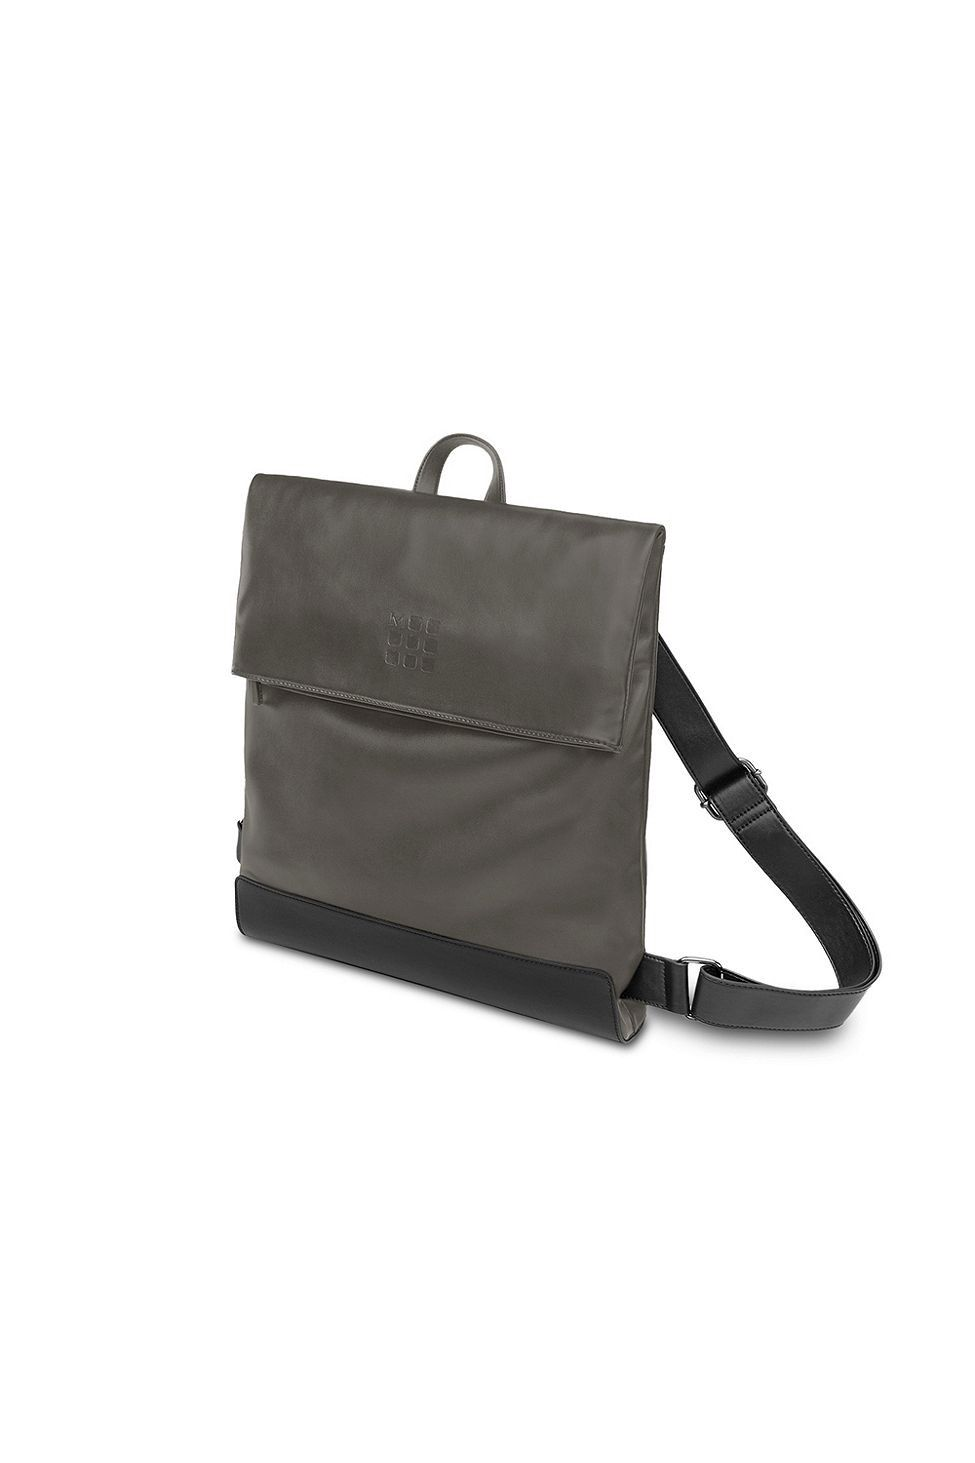 Moleskine City Travel Messenger Bag Black